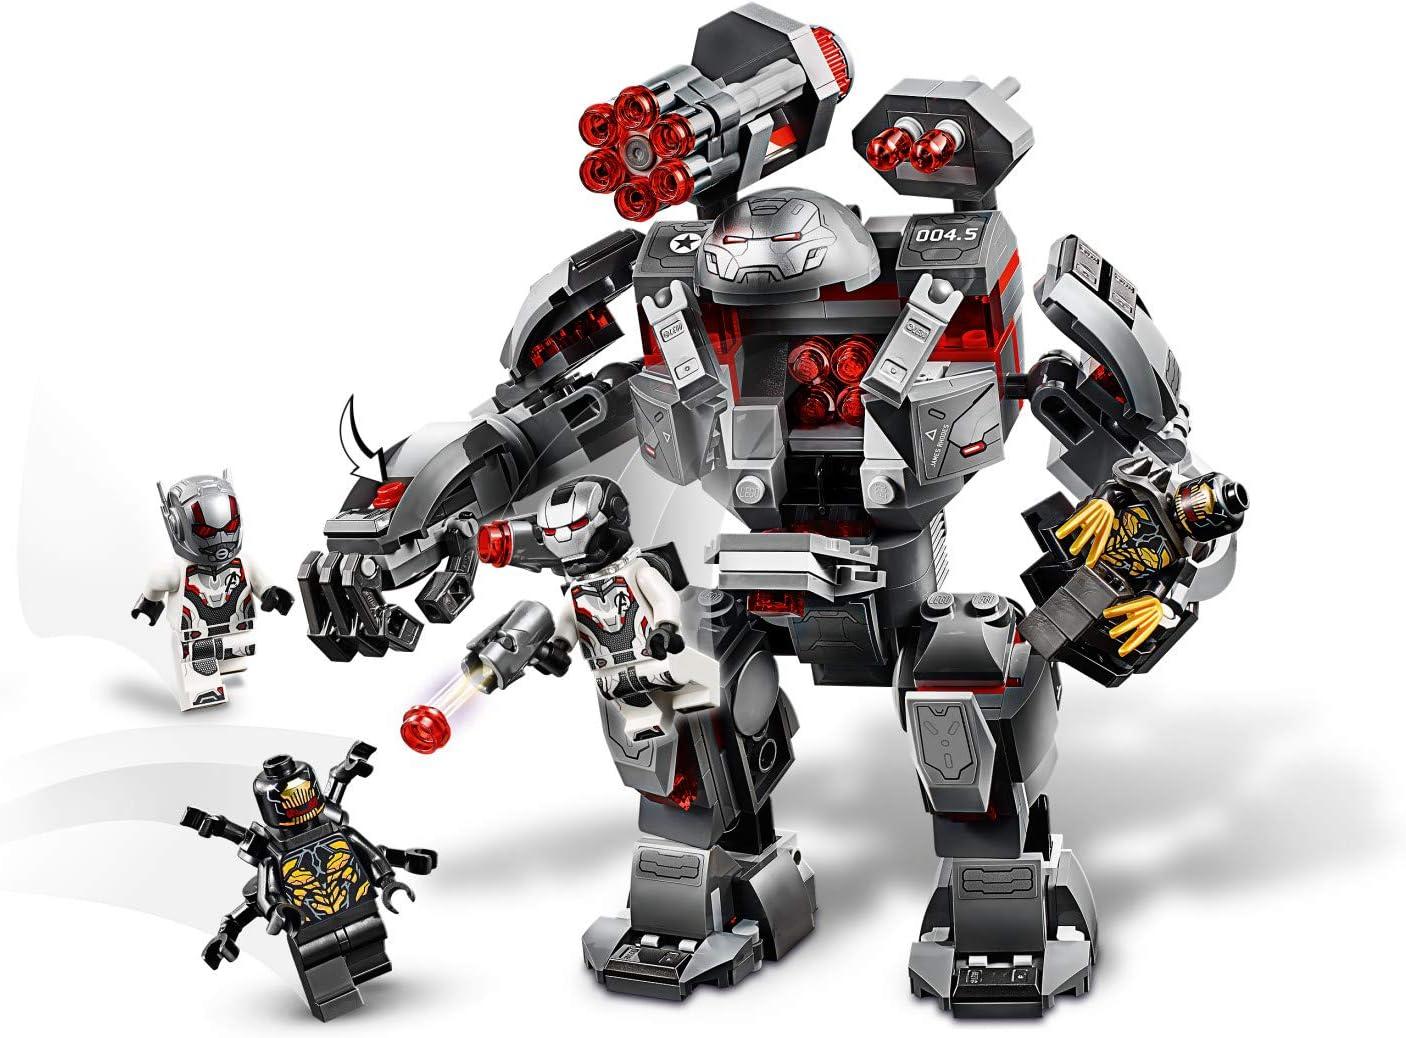 Amazing Lego Deals: The Avengers